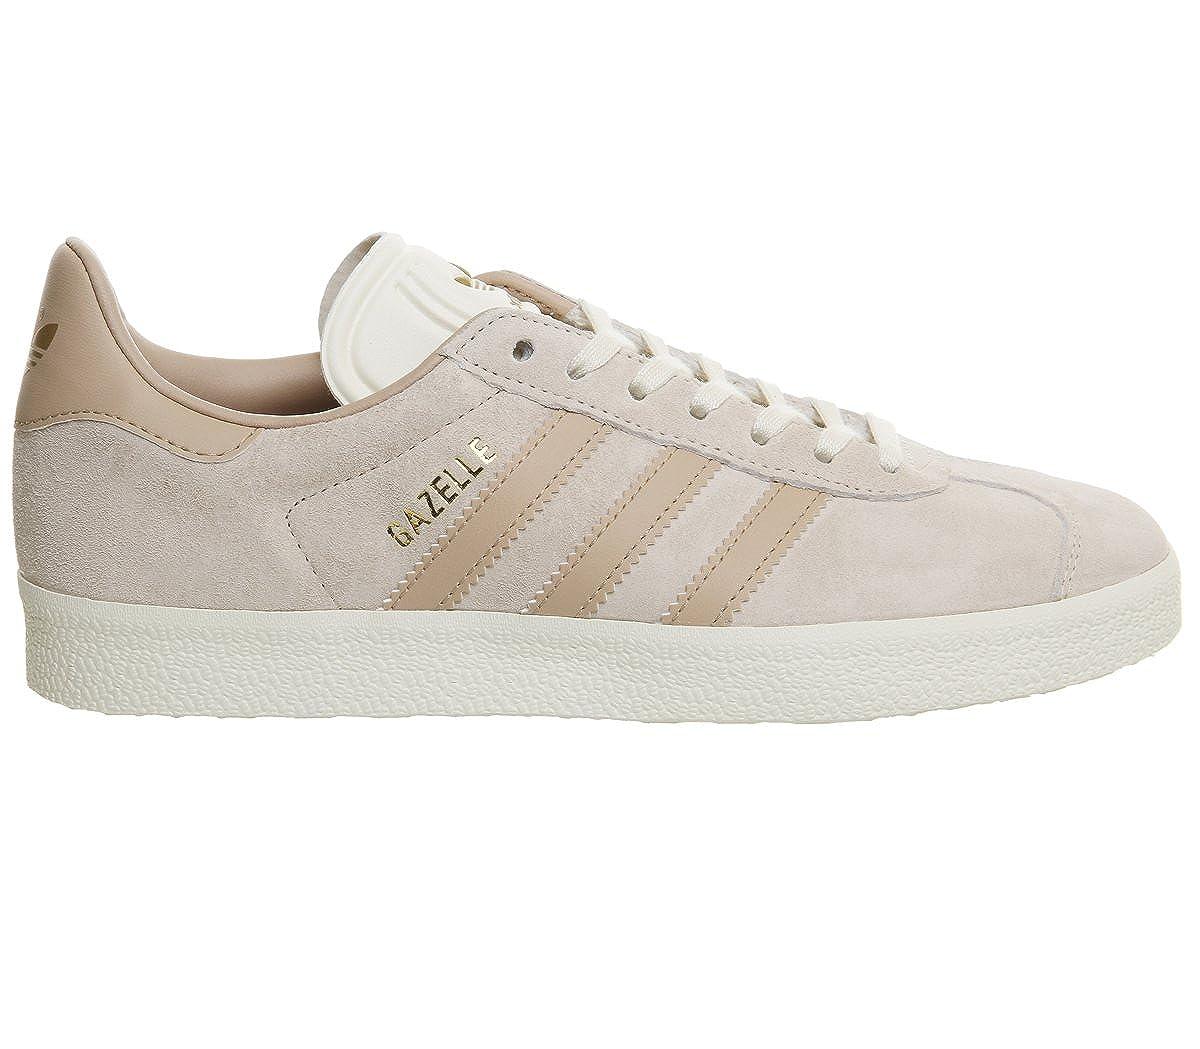 adidas Unisex Adults' Gazelle Low-Top Sneakers adidas Originals BB5476